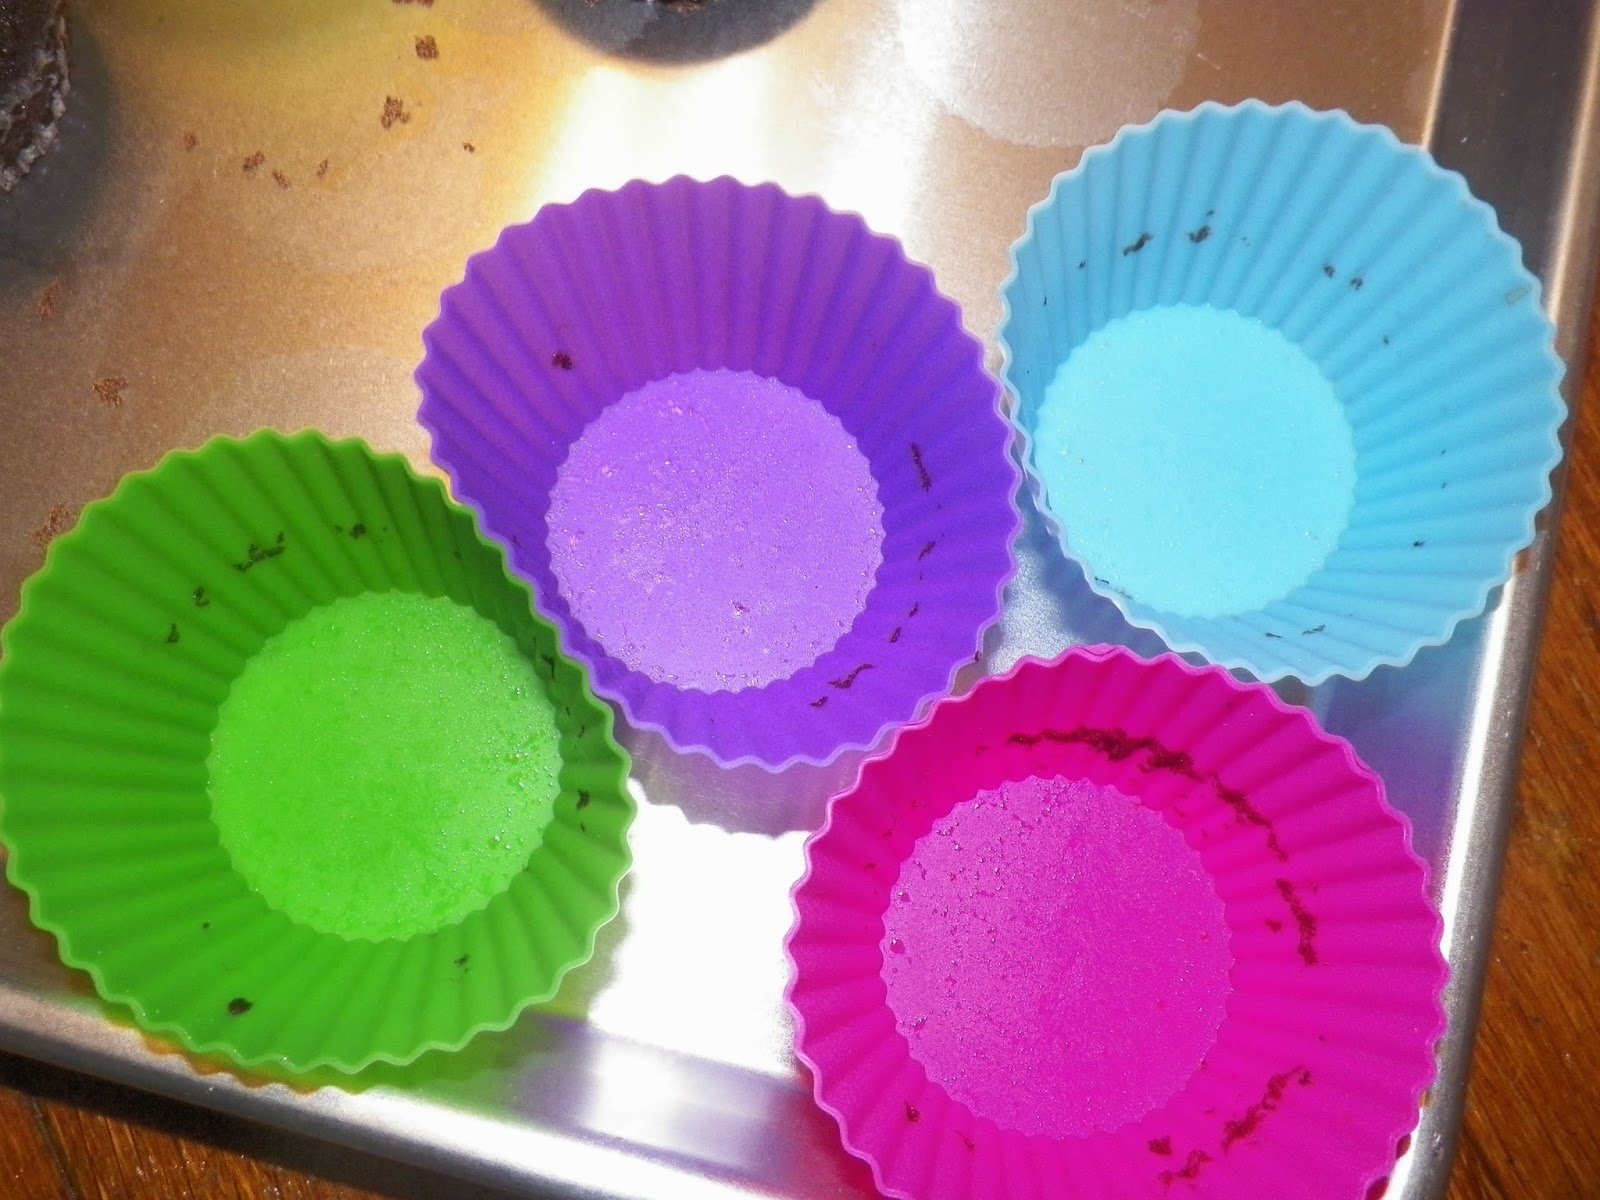 Colorful Silicone Kitchen Utensil Set